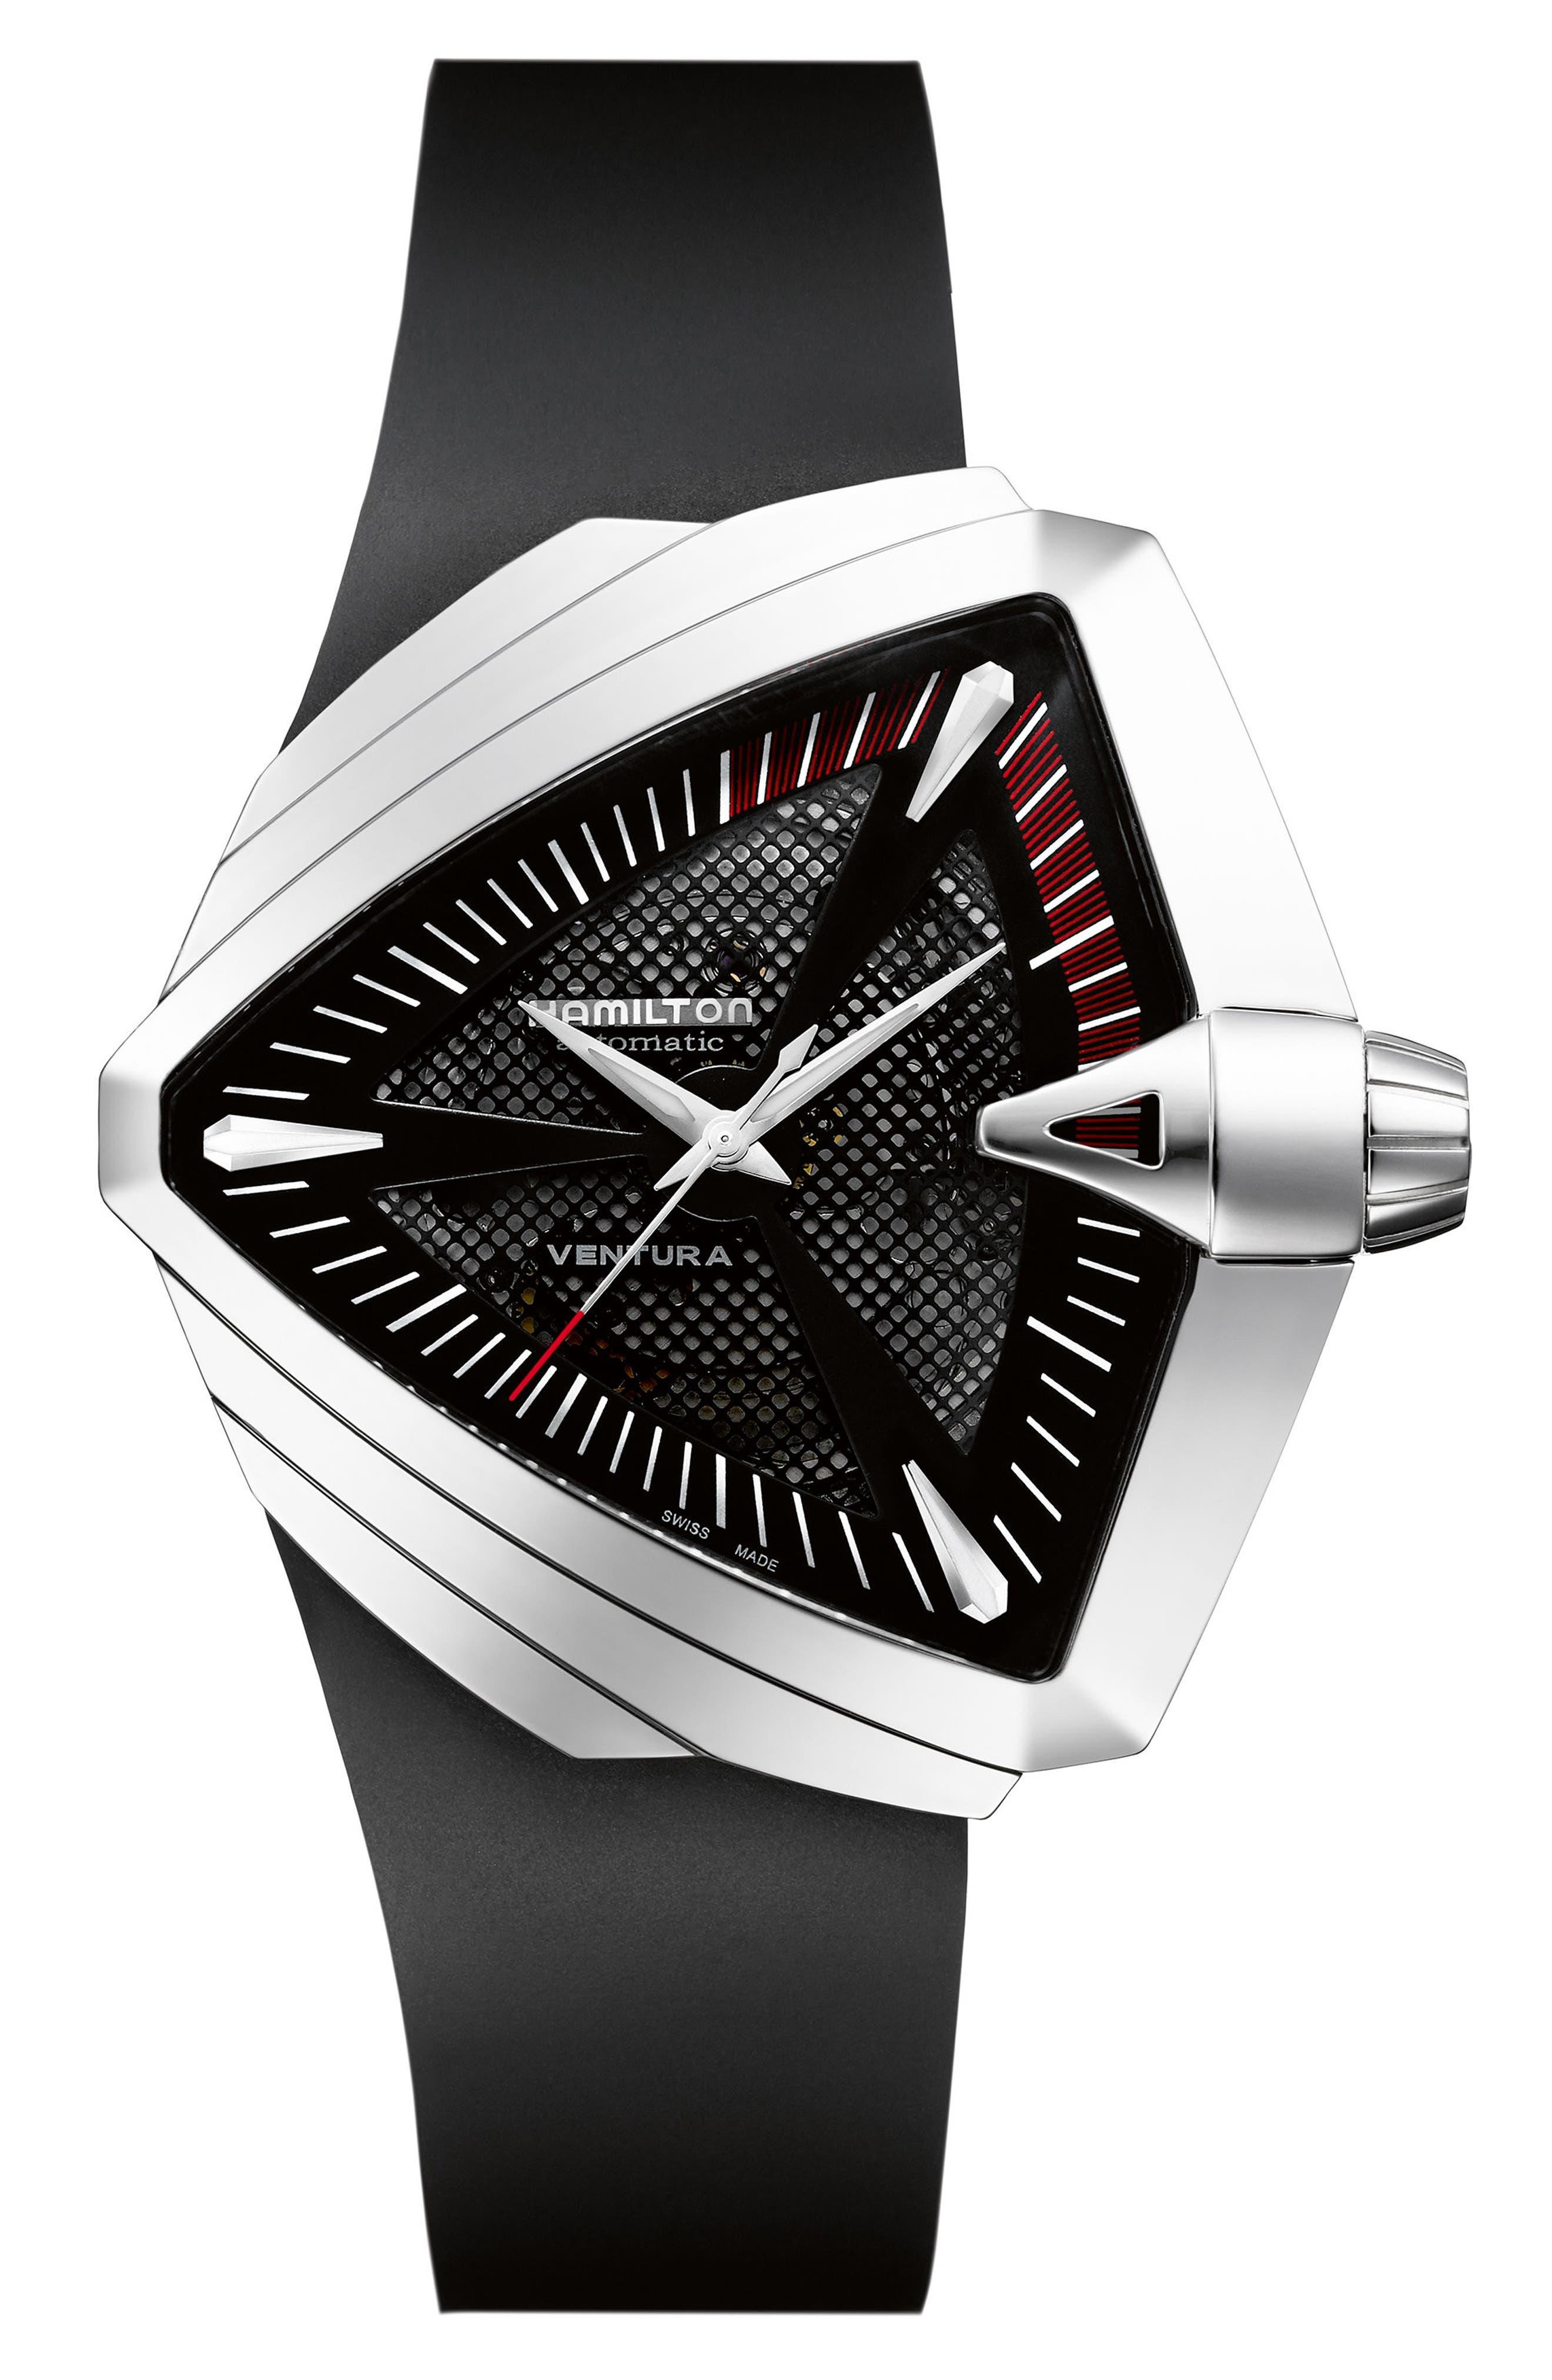 Main Image - Hamilton Ventura Automatic Rubber Strap Watch, 45.5mm x 46mm